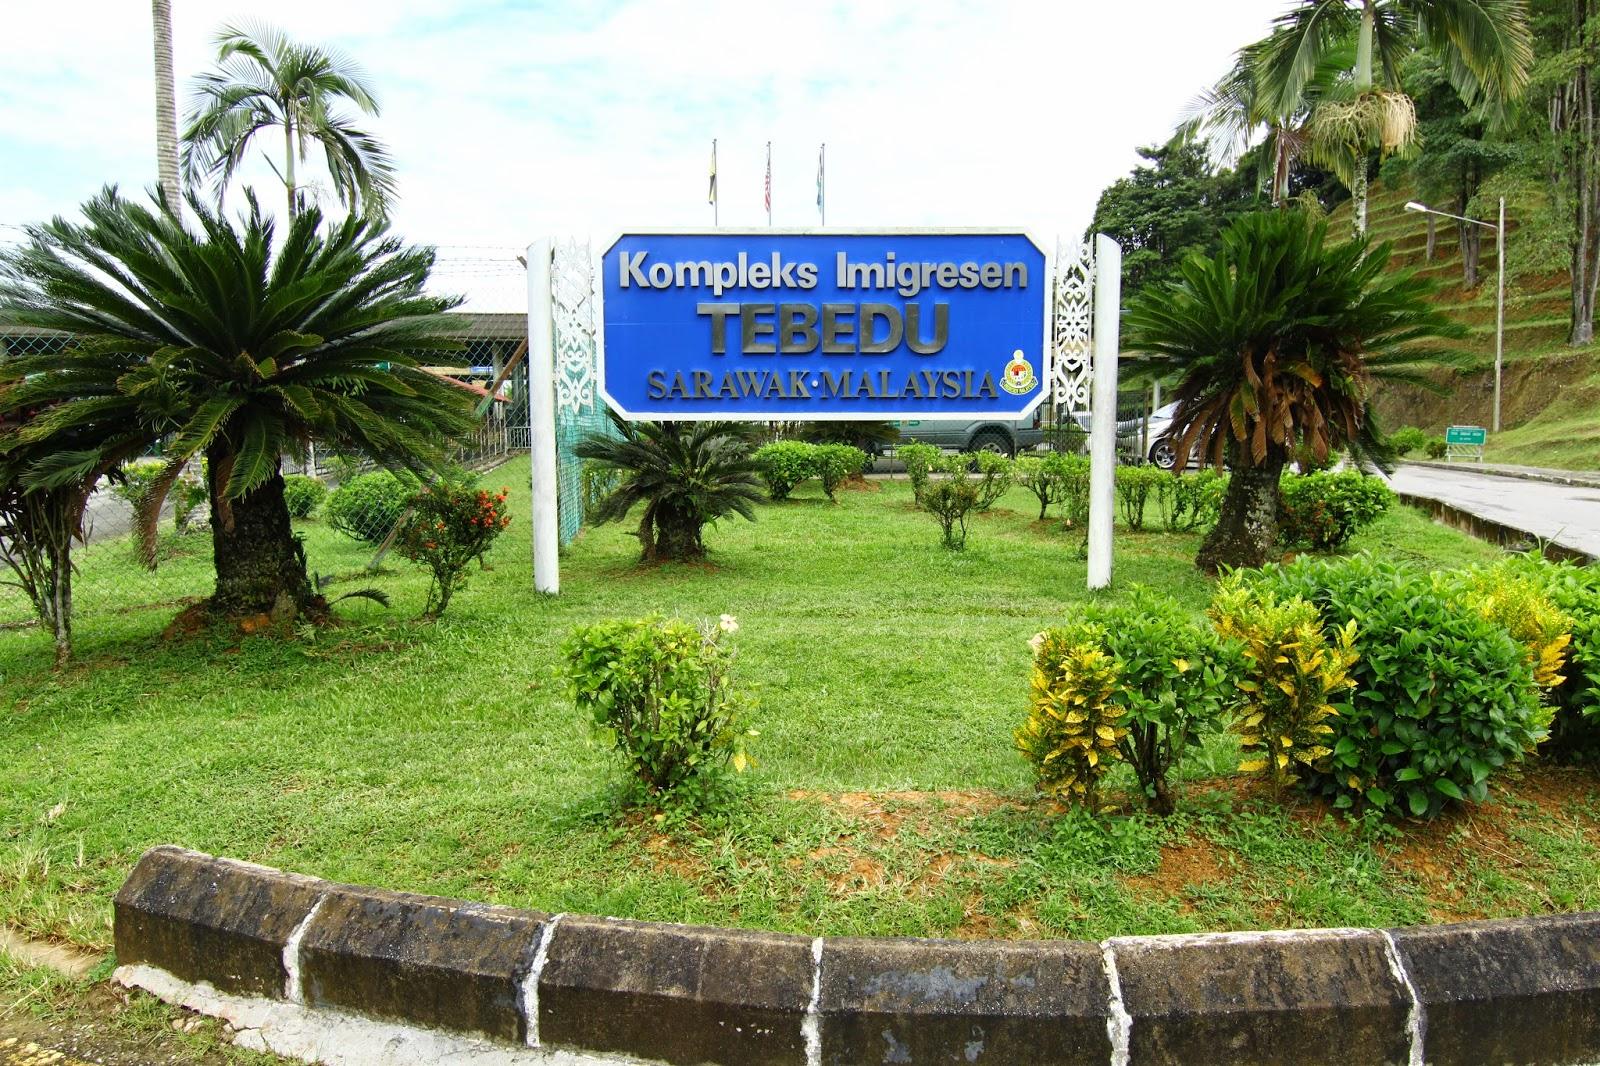 Kompleks Imigresen Malaysia di Tebedu, Sarawak